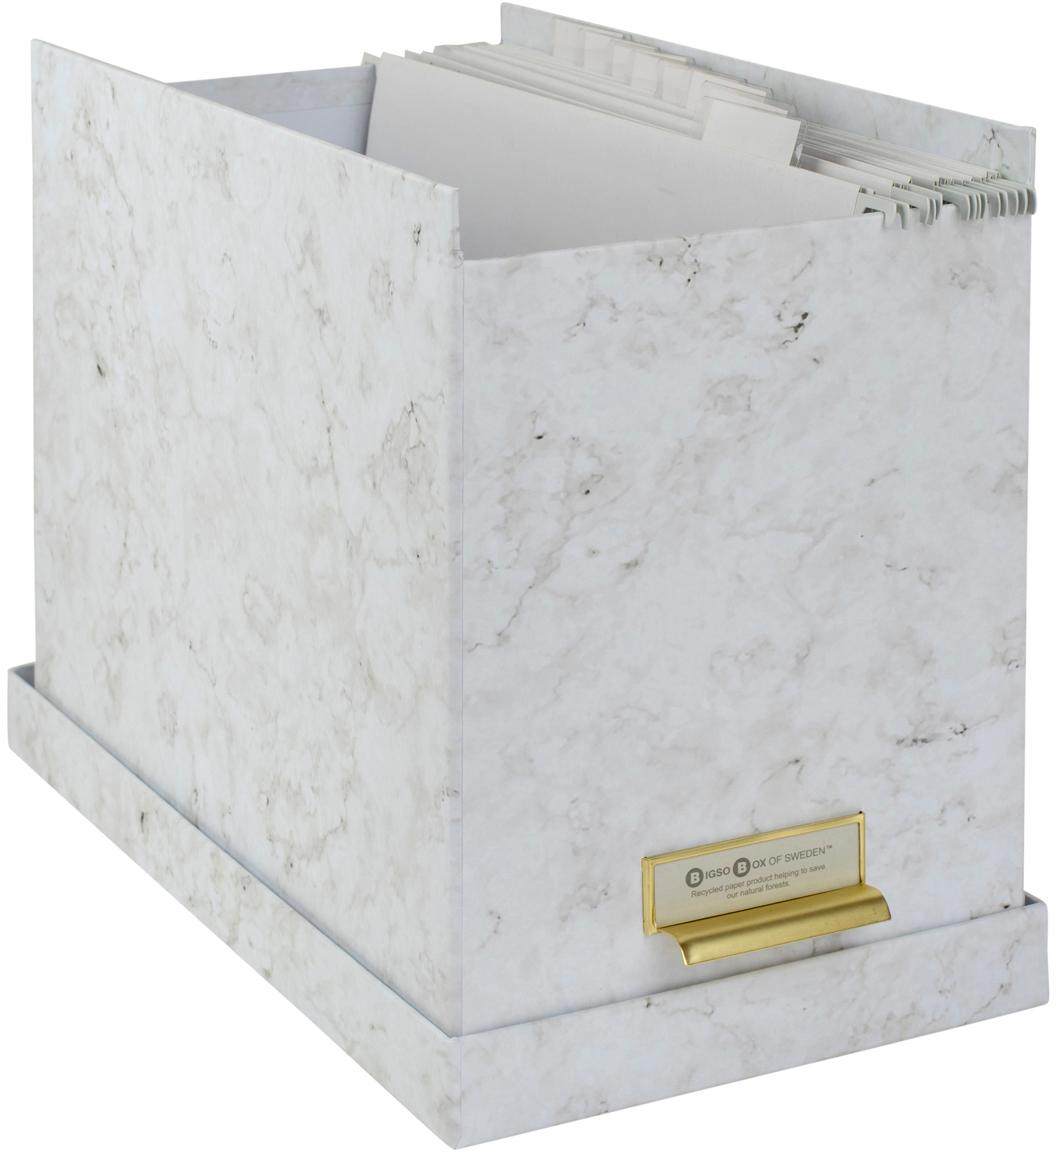 Hängeregister-Box Johan, 9-tlg., Organizer: Fester, laminierter Karto, Weiss, marmoriert, 19 x 27 cm